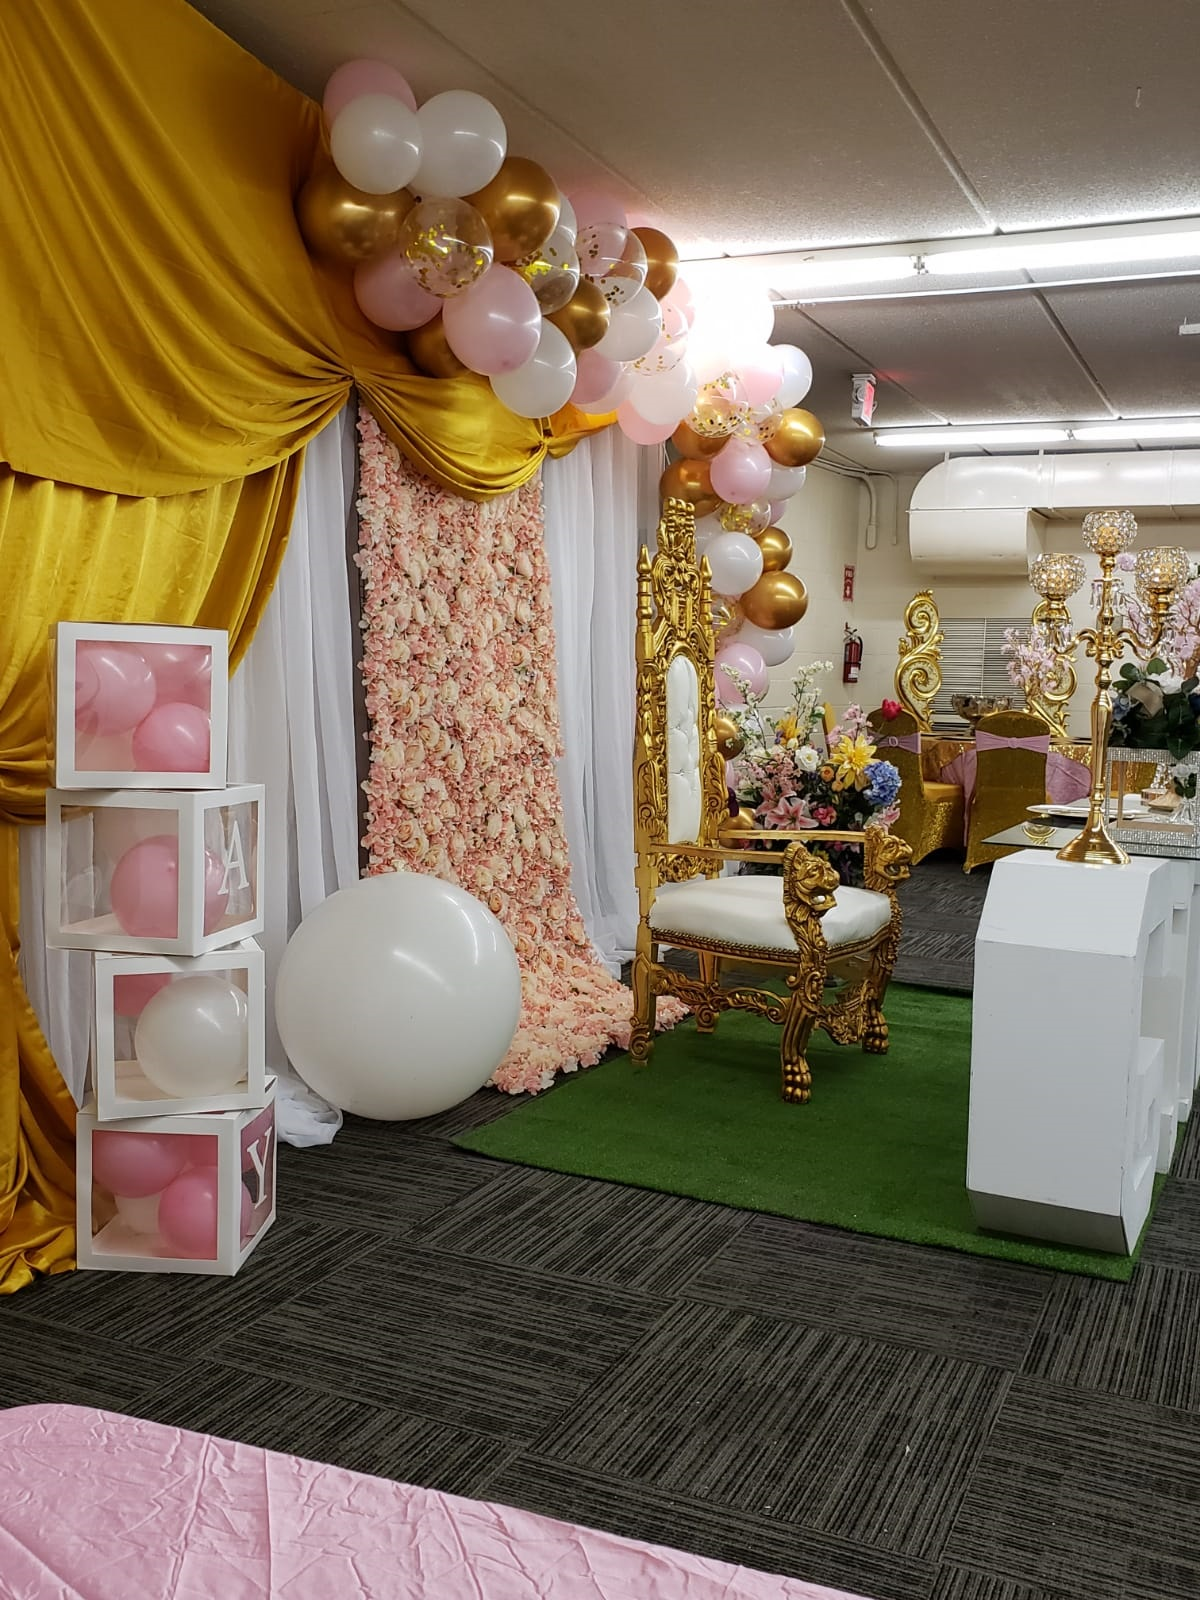 Gallery (19)